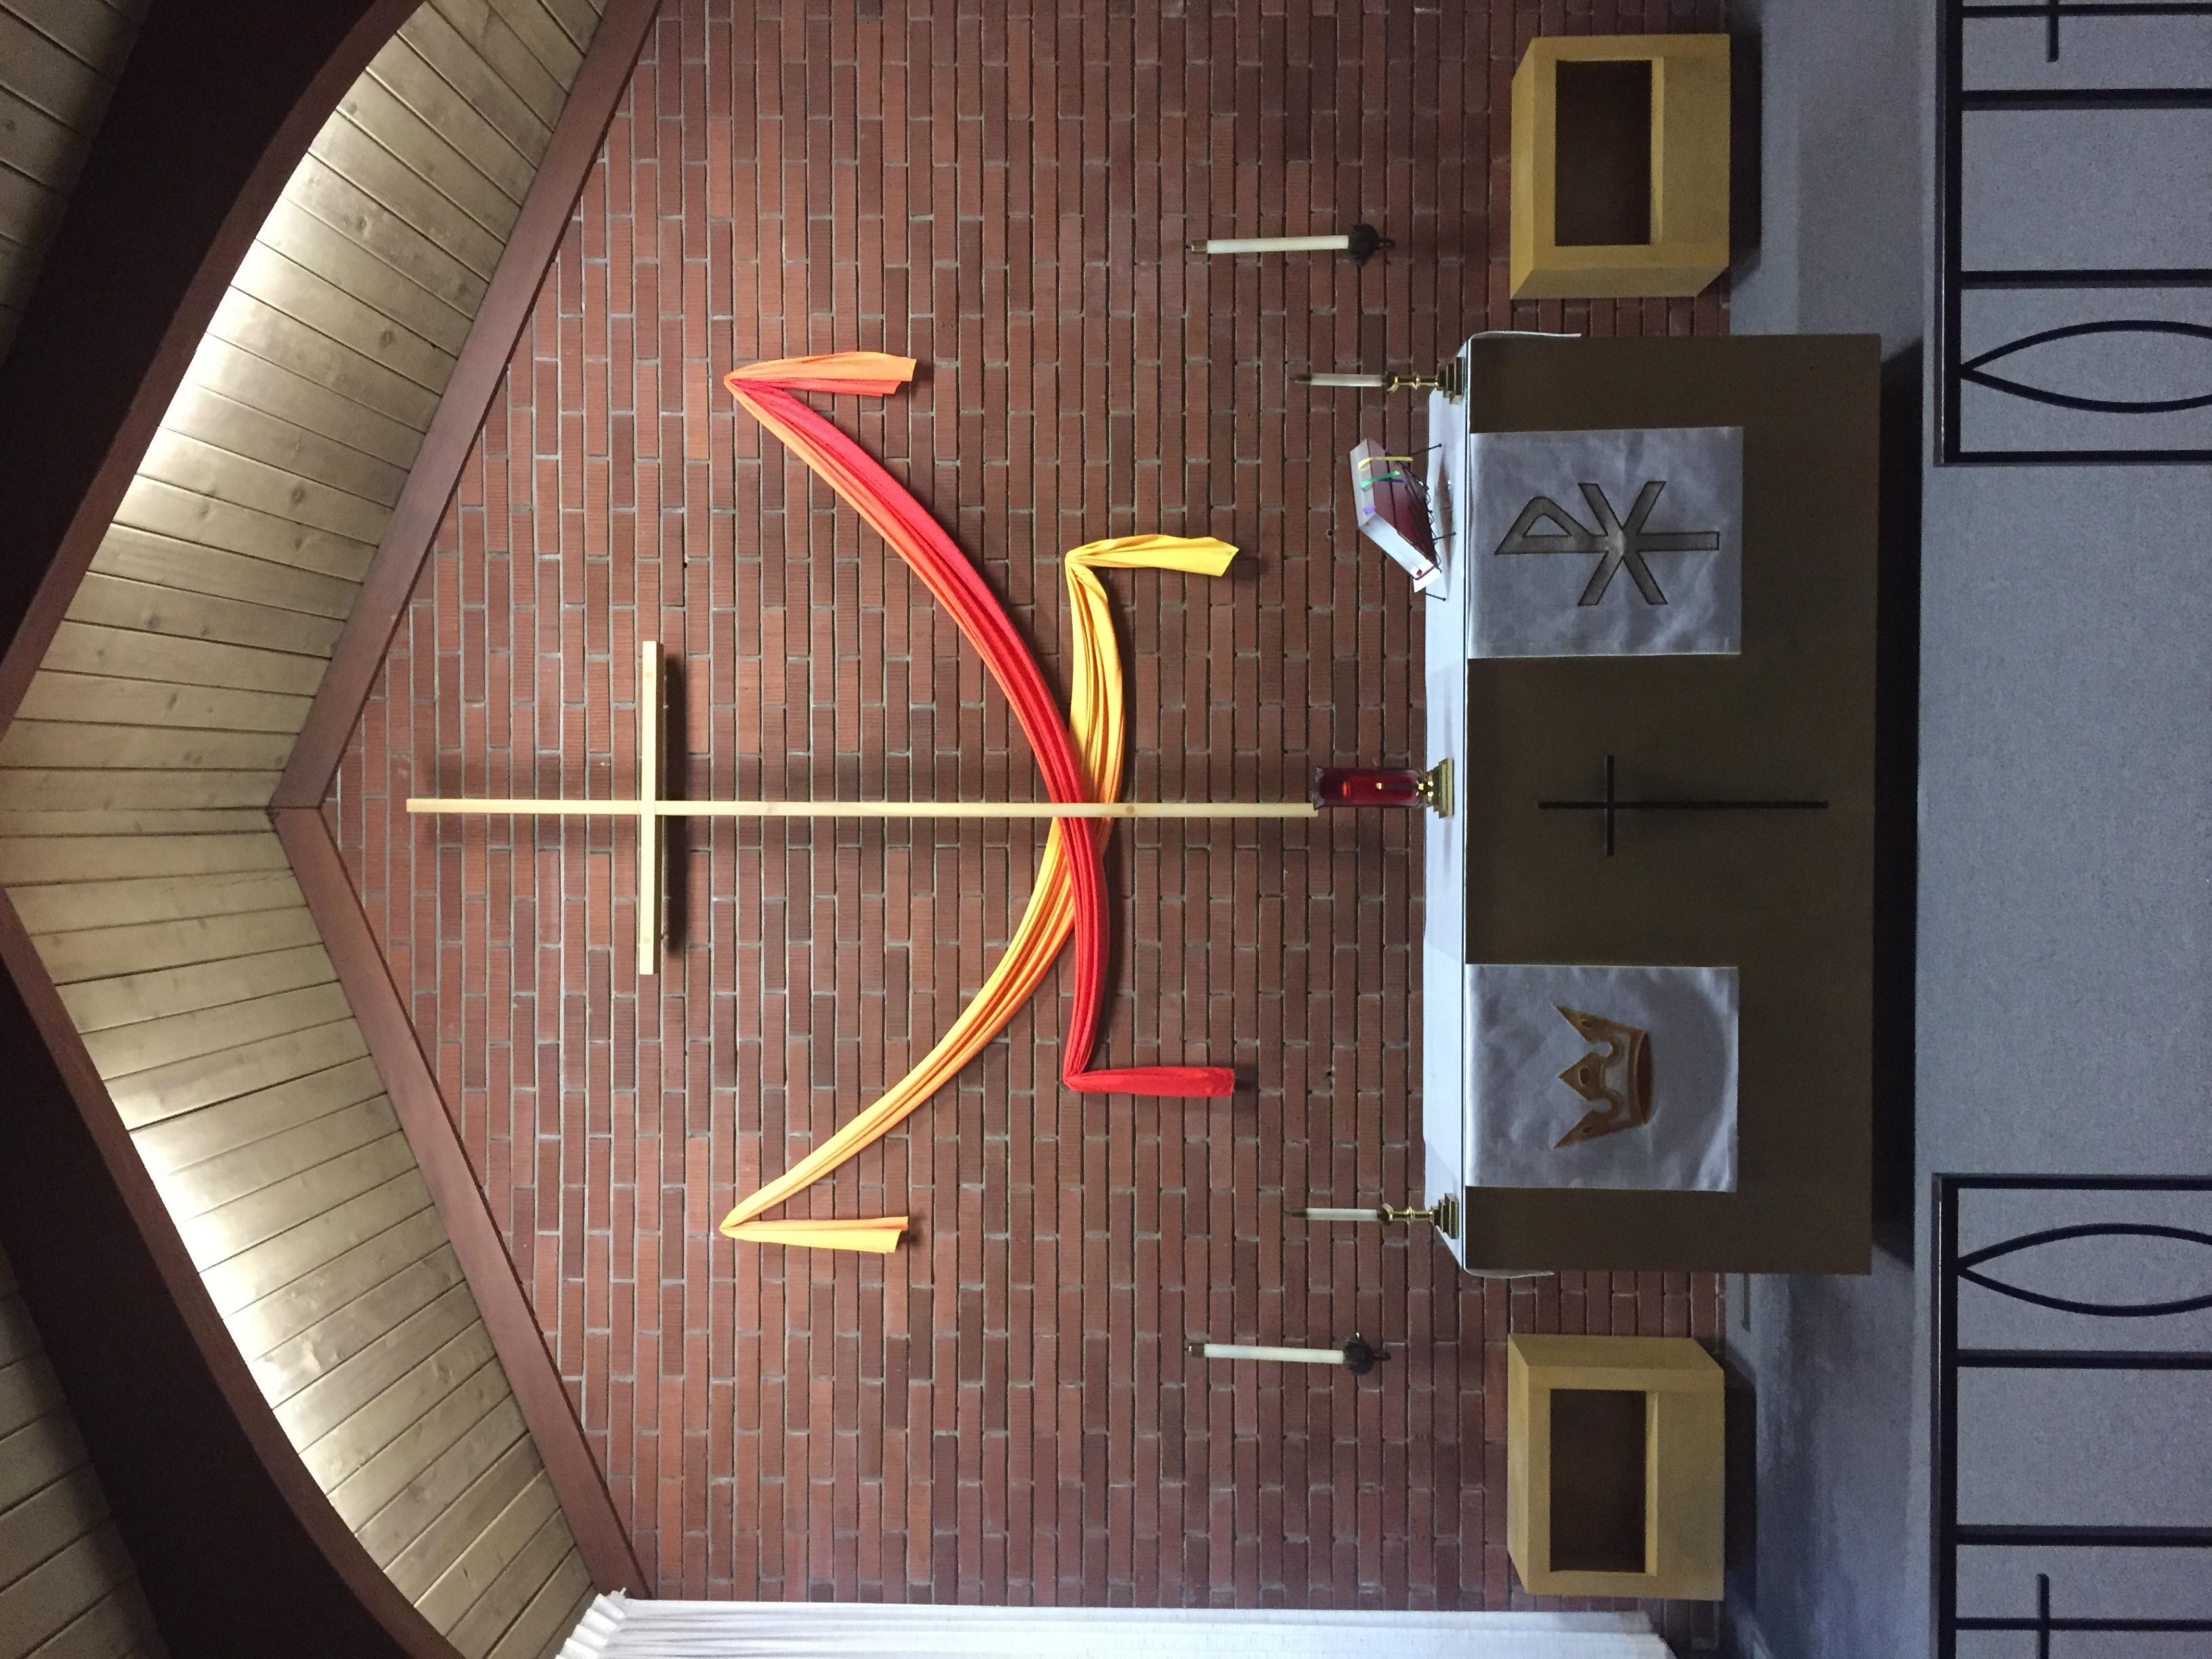 Shepherd of the Hills Lutheran Church ELCA, Concrete, WA | 46372 E Main St, Concrete, WA, 98237 | +1 (360) 853-3714